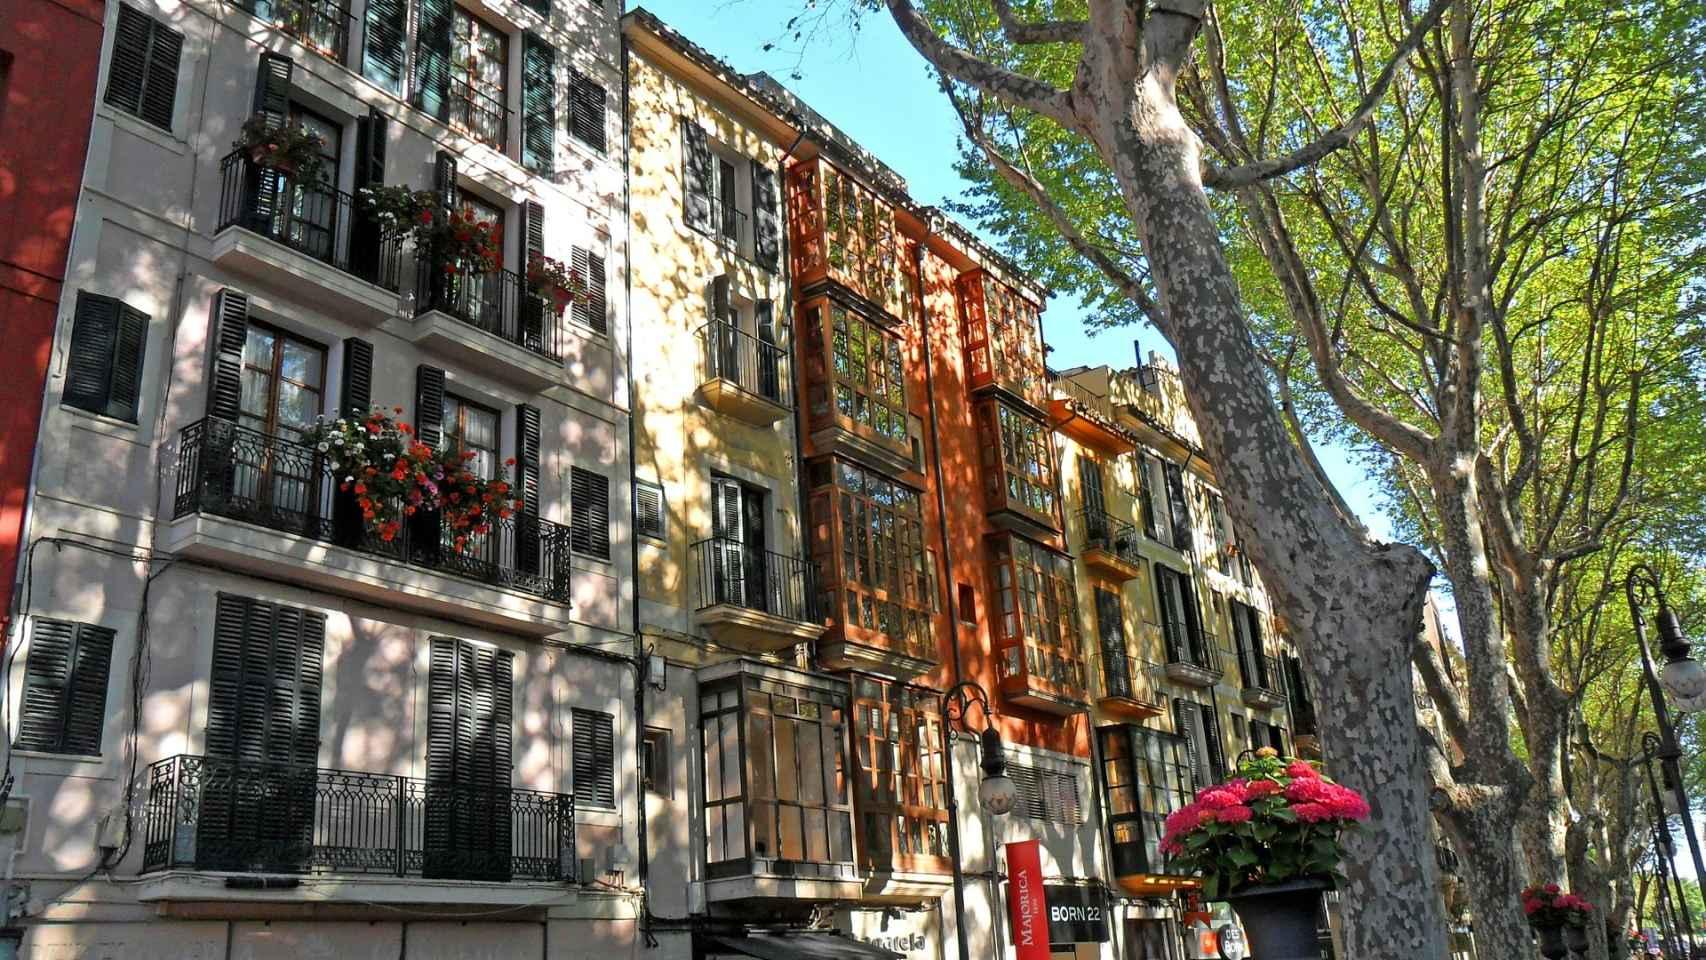 Imagen de una calle de Palma de Mallorca.